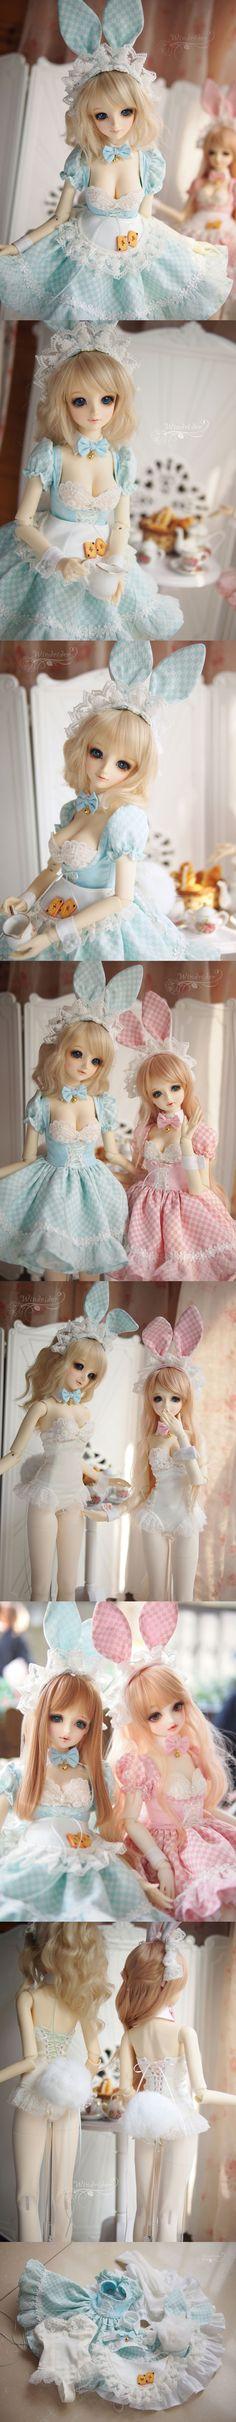 BJD Clothes Girl Blue Dress Set for SD Ball-jointed Doll_CLOTHING_Ball Jointed Dolls (BJD) company-Legenddoll